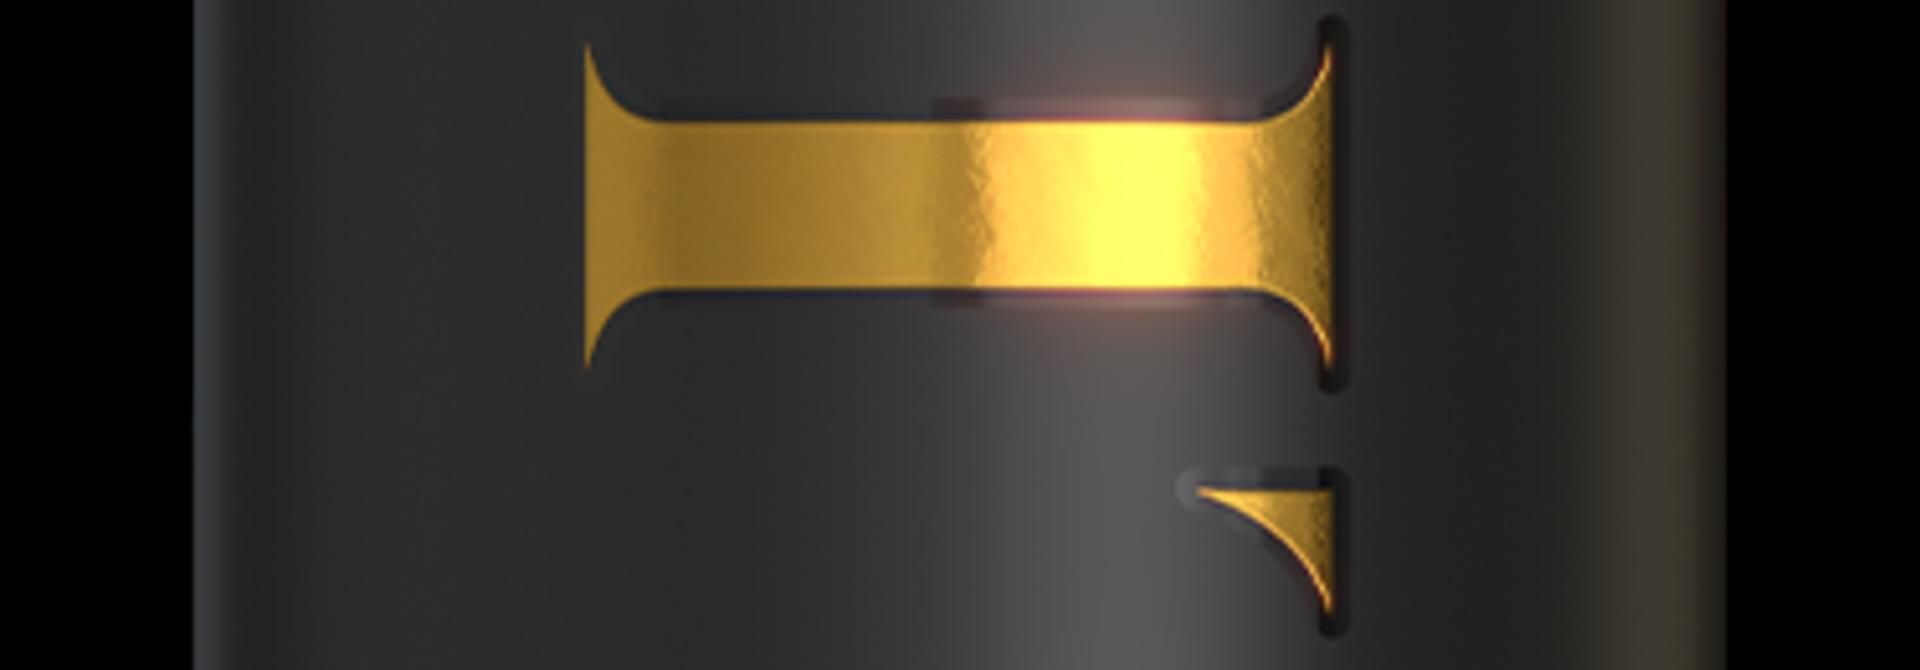 Gold Dry VODKA 0.7ltr by Joel Beukers